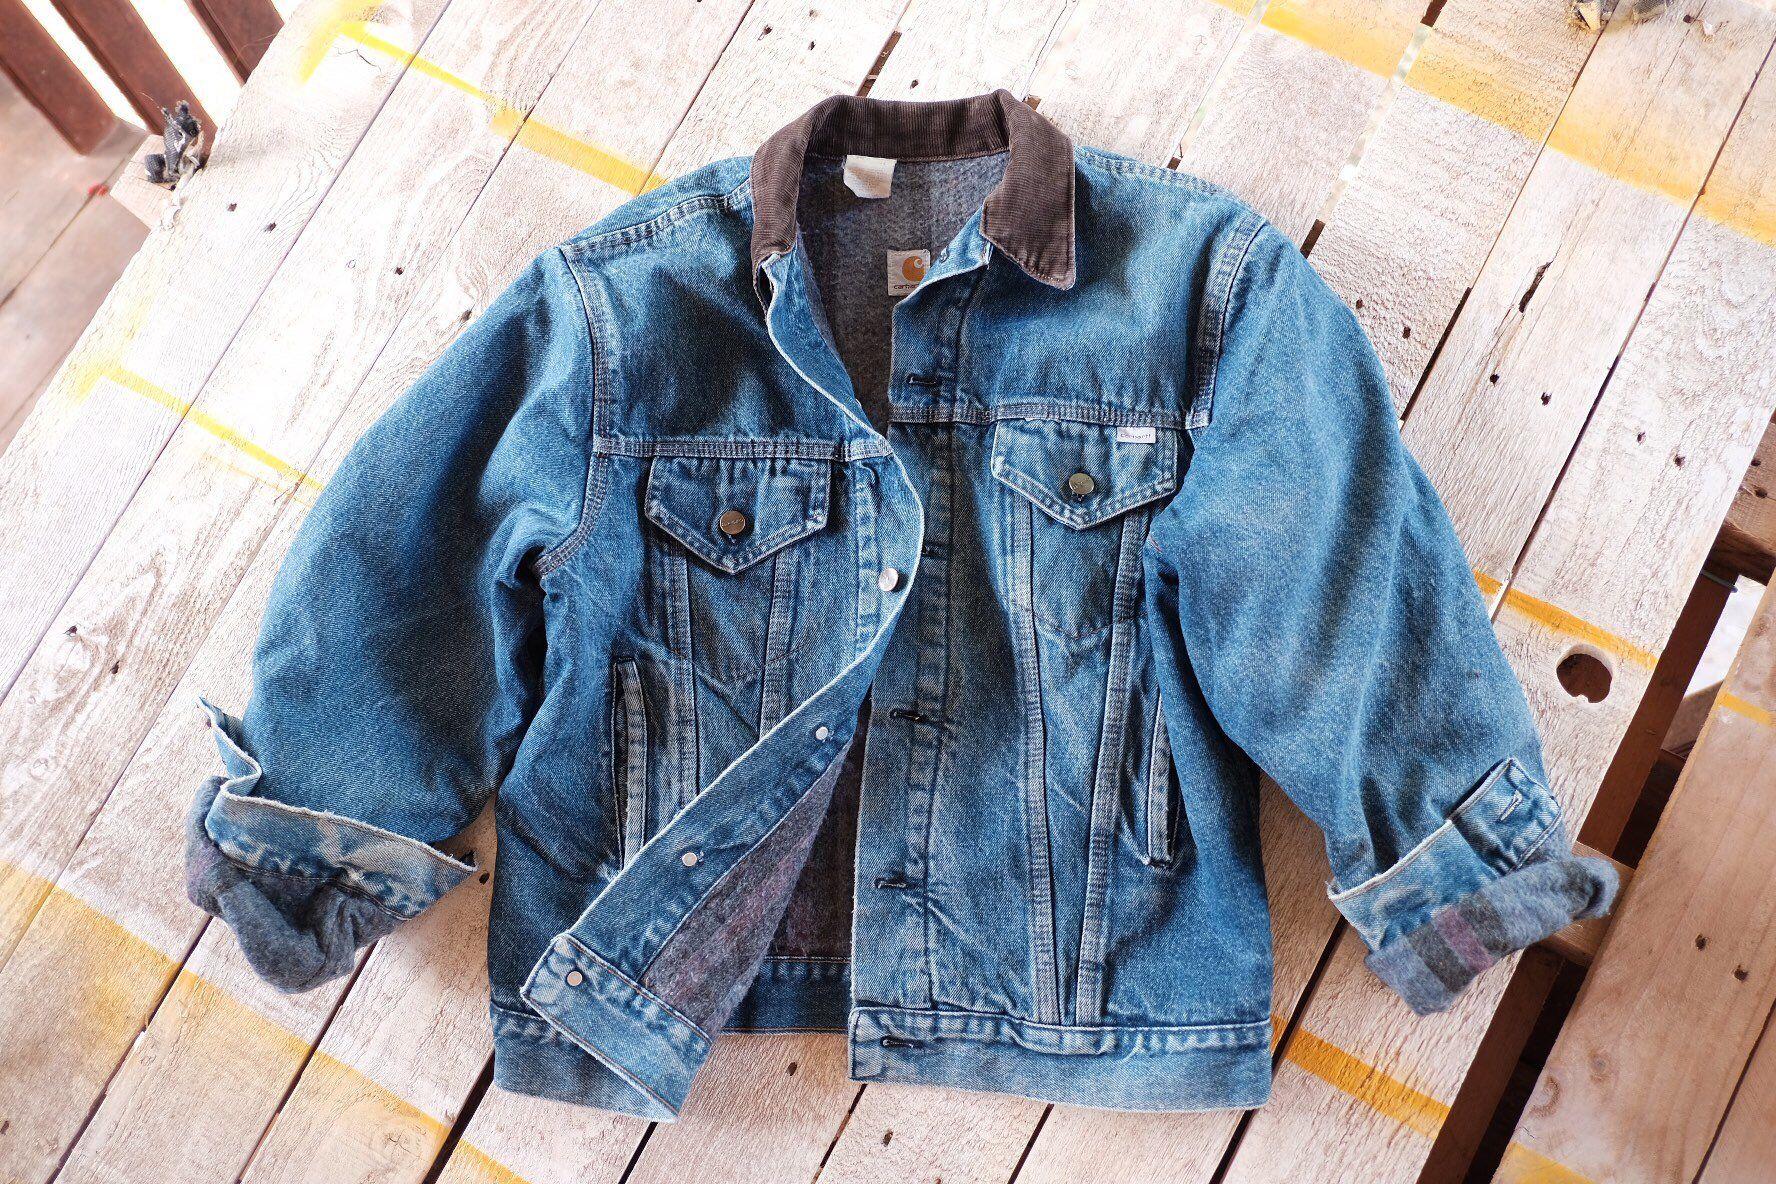 Rare Vintage Carhartt Denim Jacket Brown Corduroy Collar Etsy Carhartt Denim Jacket Carhartt Jacket Denim Jacket [ 1184 x 1776 Pixel ]